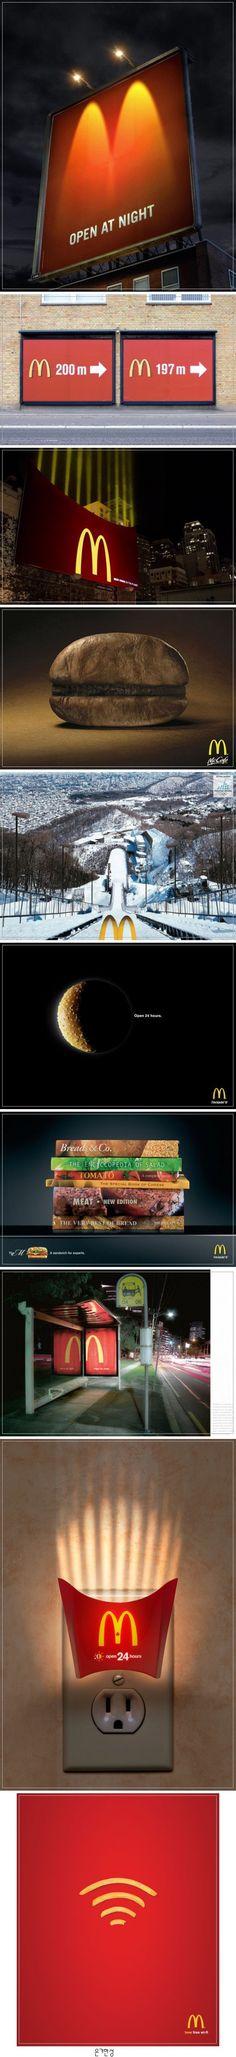 20 Creative McDonalds Ads  기발한 맥도널드 광고 모음